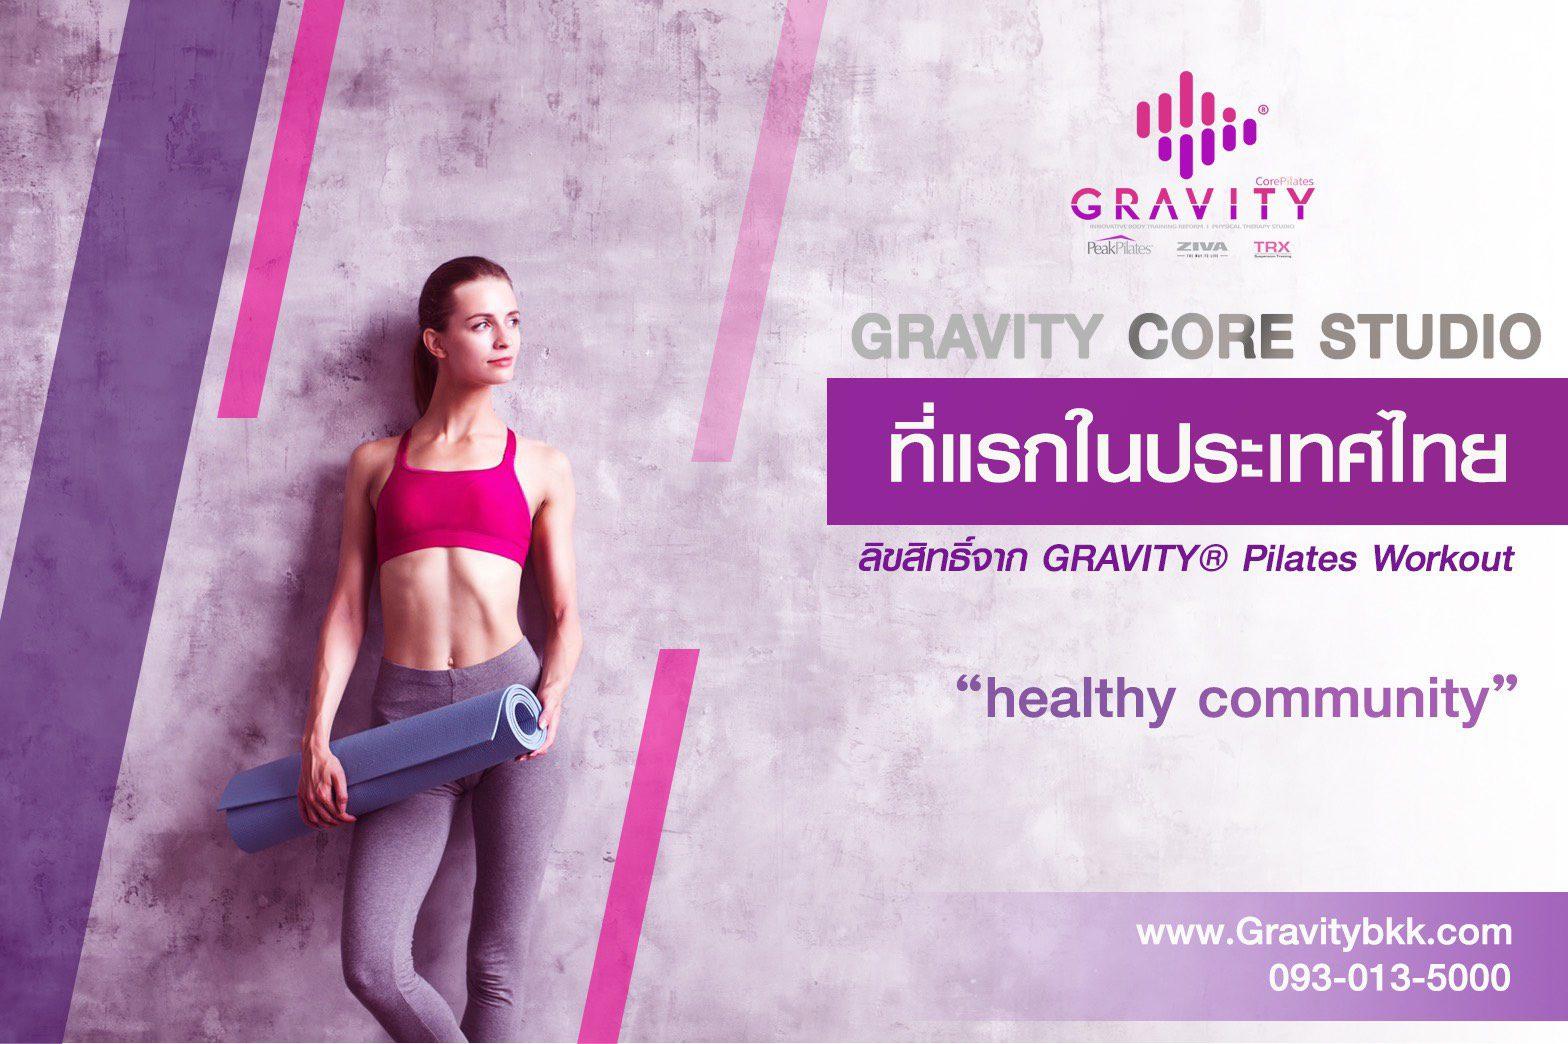 """GRAVITY CORE STUDIO ทางเลือกใหม่สำหรับคนรักการออกกำลังกาย แนว Pilates Yoga และ Rhythm Studio, ในสไตล์  Core Boutique Studio ที่ไม่เหมือนใคร"